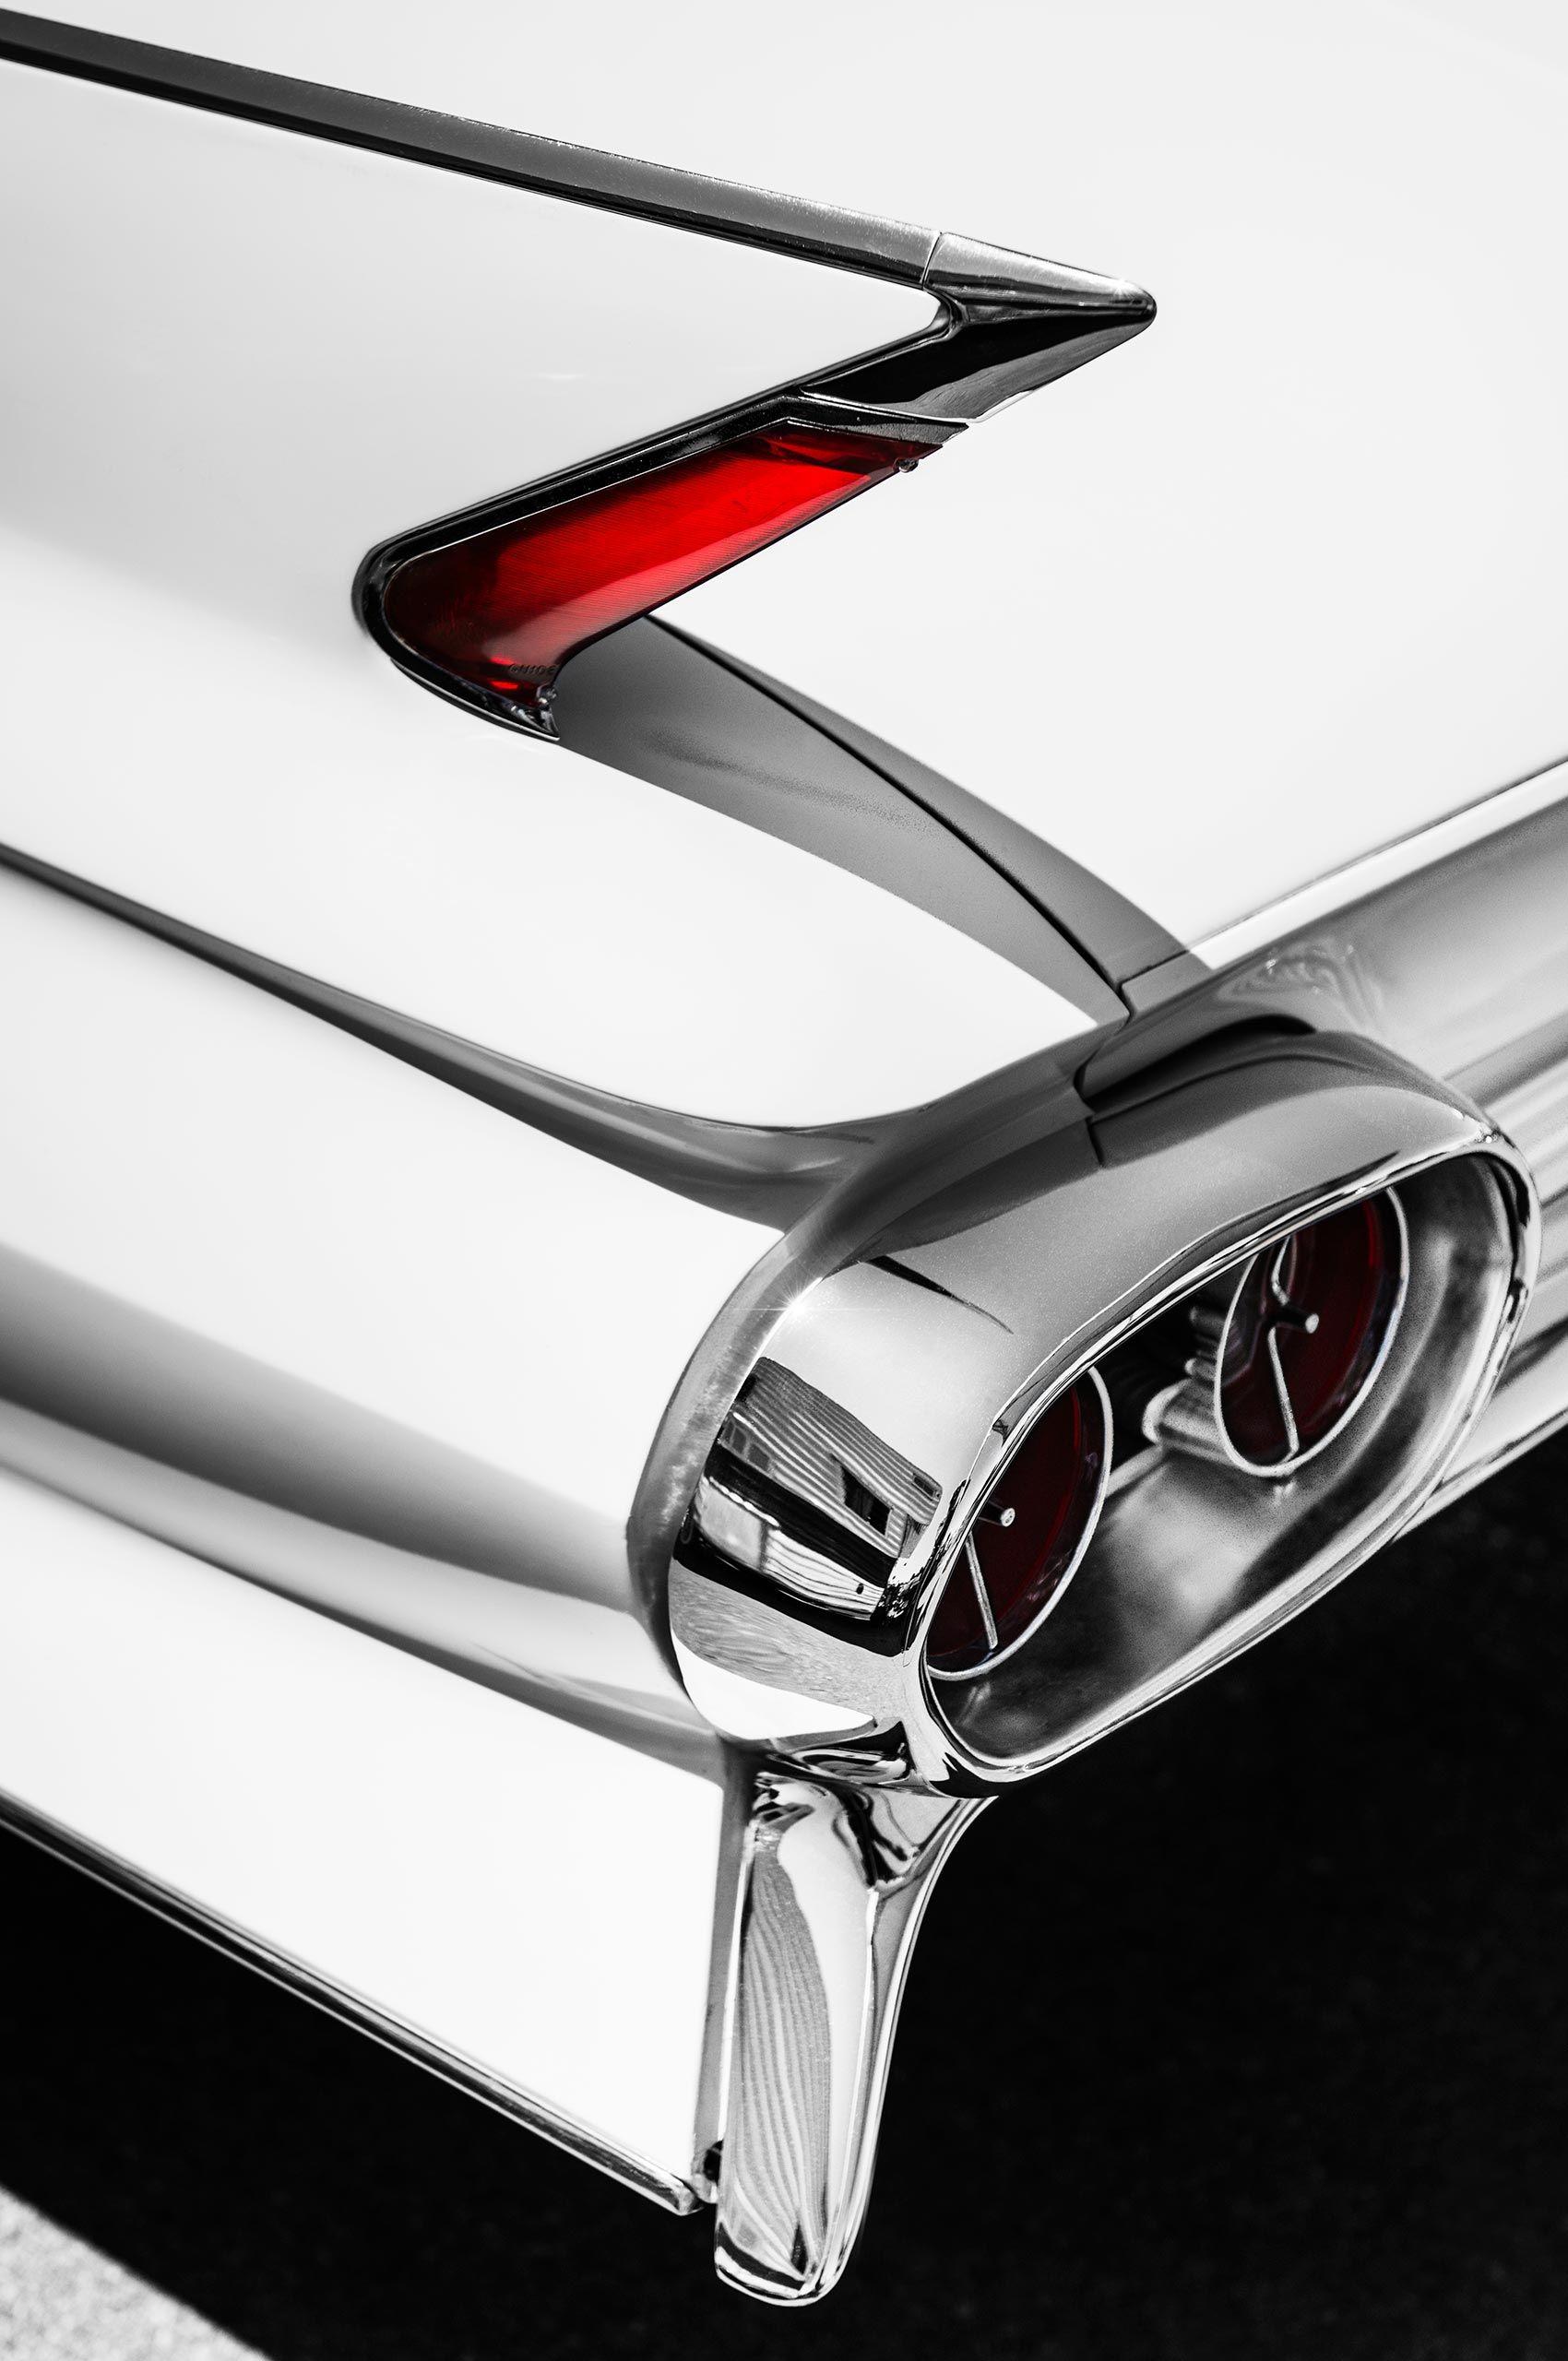 car-fin-detail-vivalasvegas-HenrikOlundPhotography.jpg